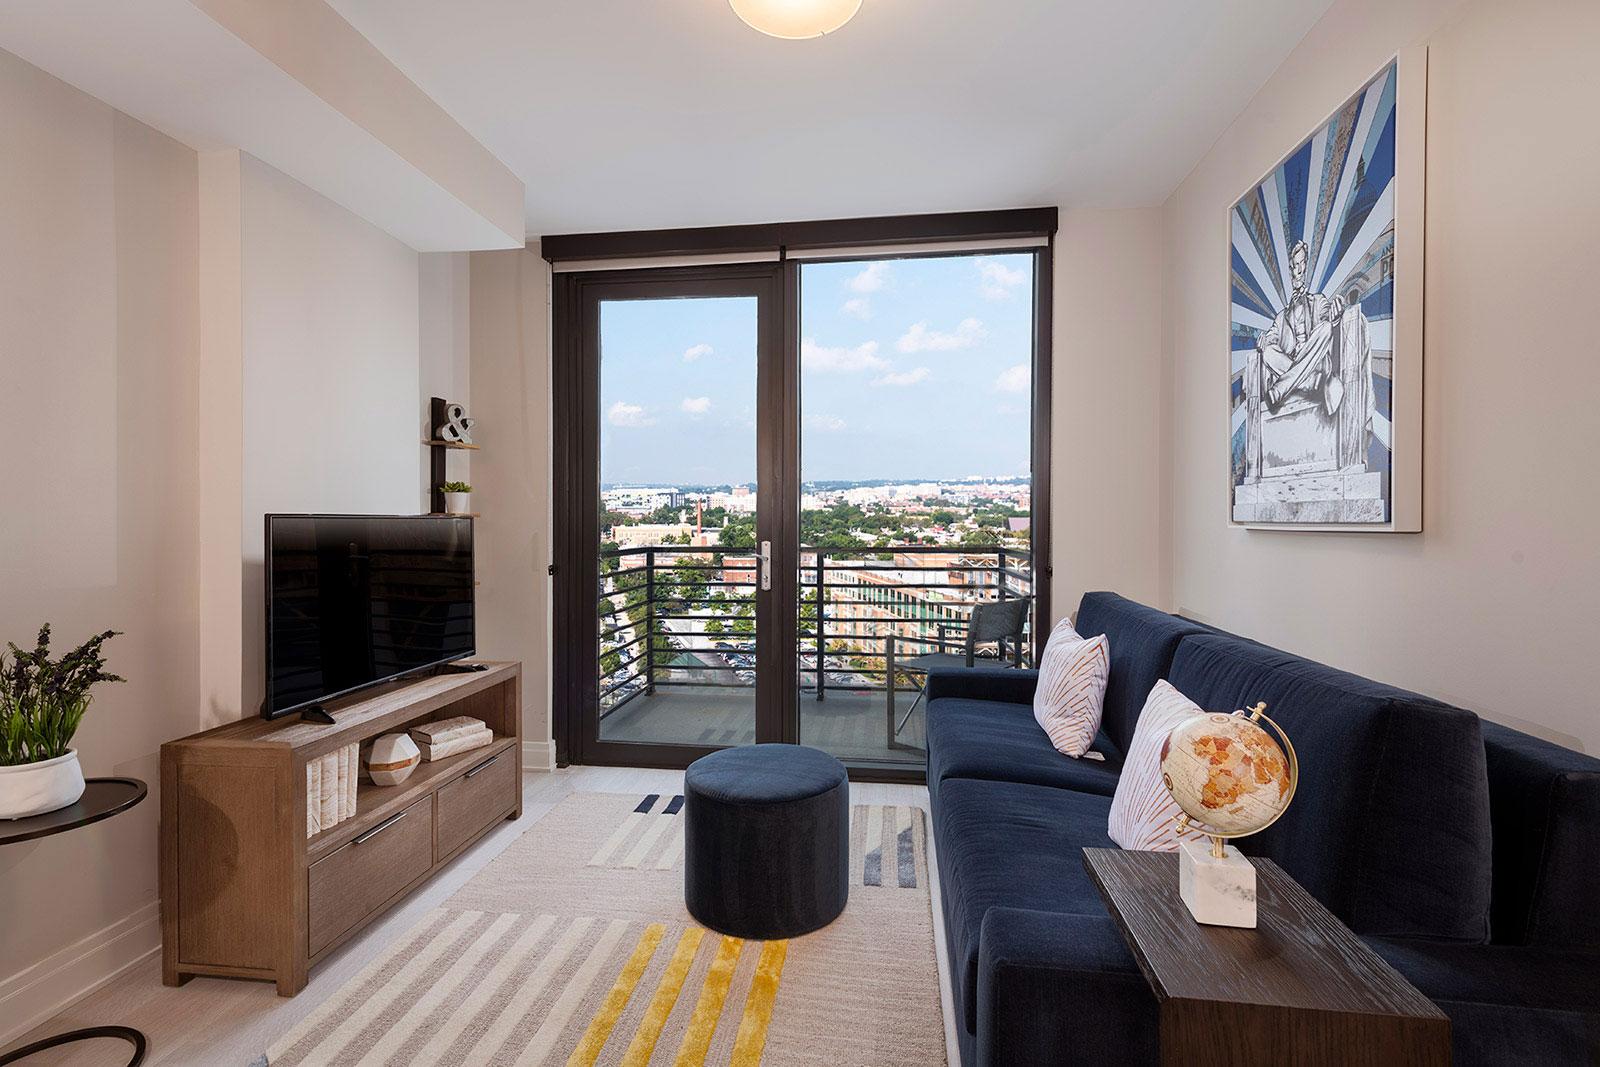 living room opens to balcony